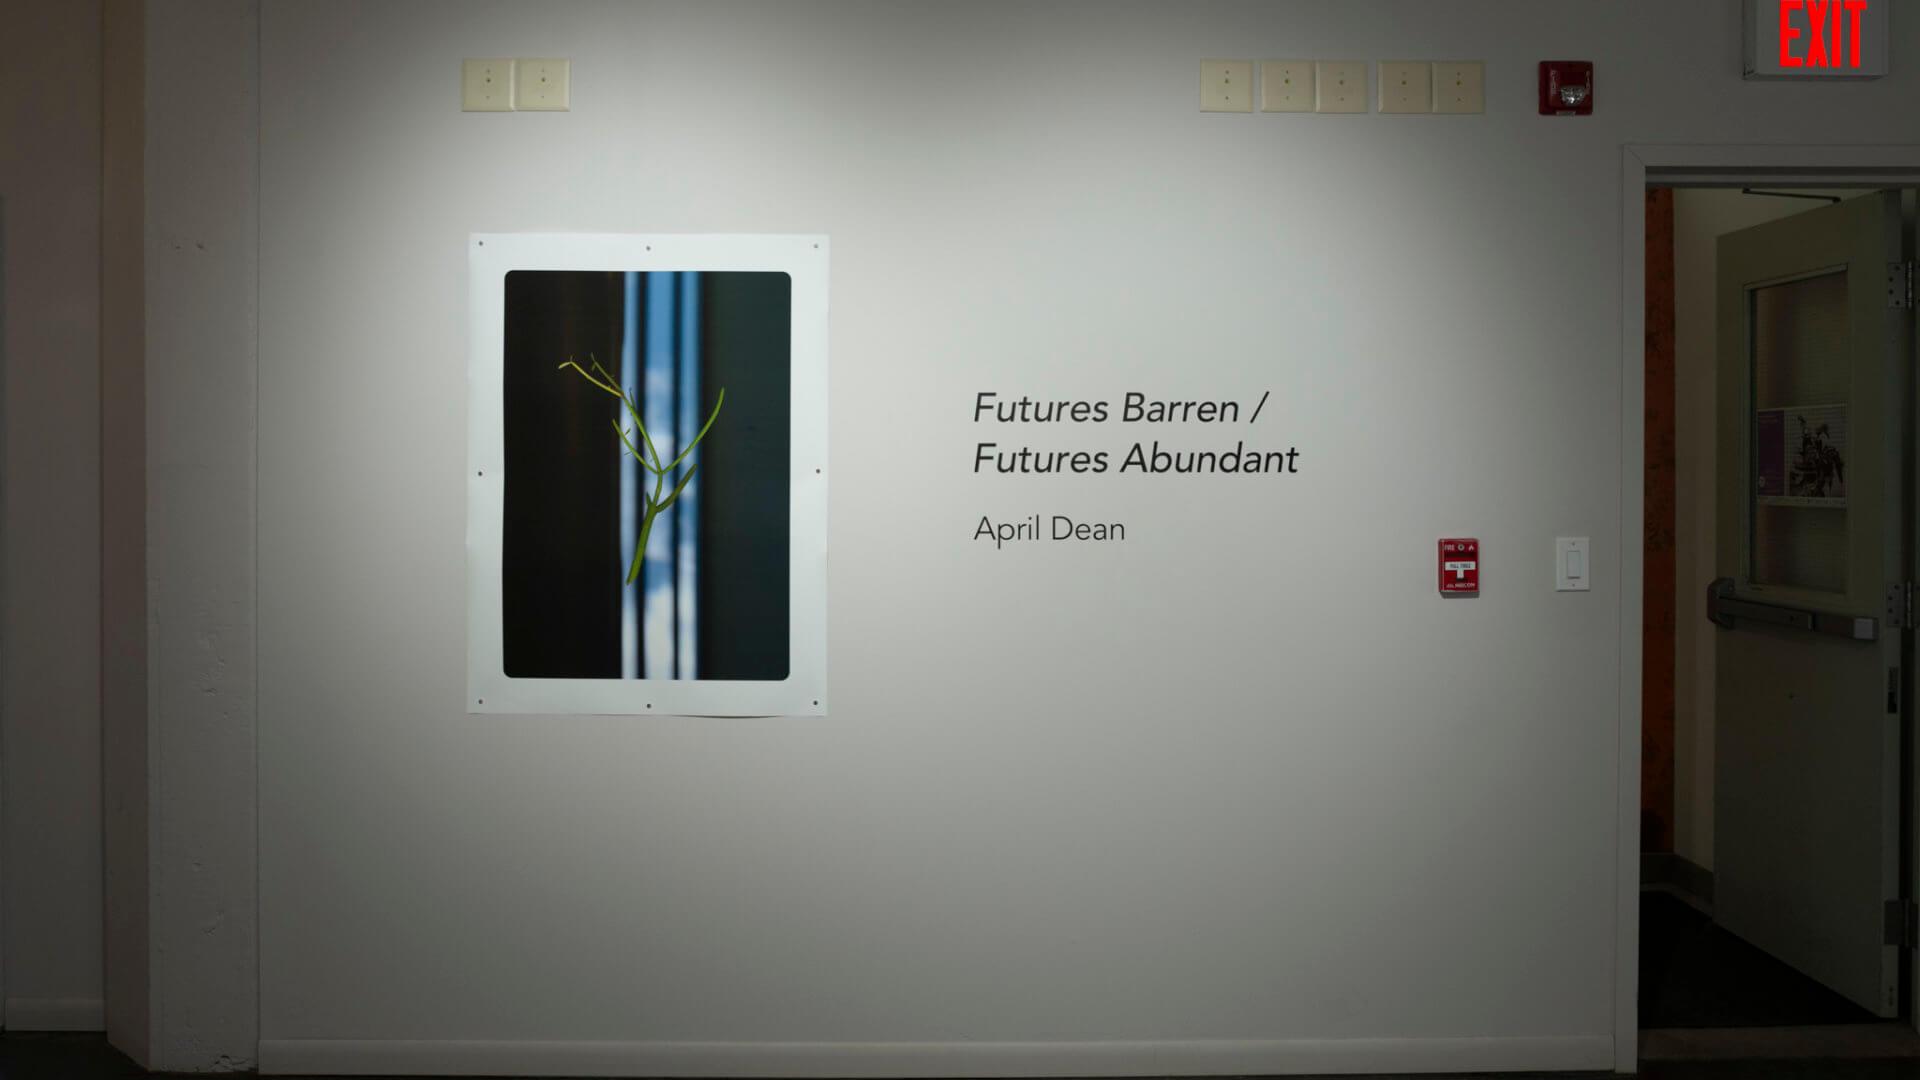 Installation view of Futures Barren/Futures Abundant by April Dean. Image credit: Sarah Fuller.